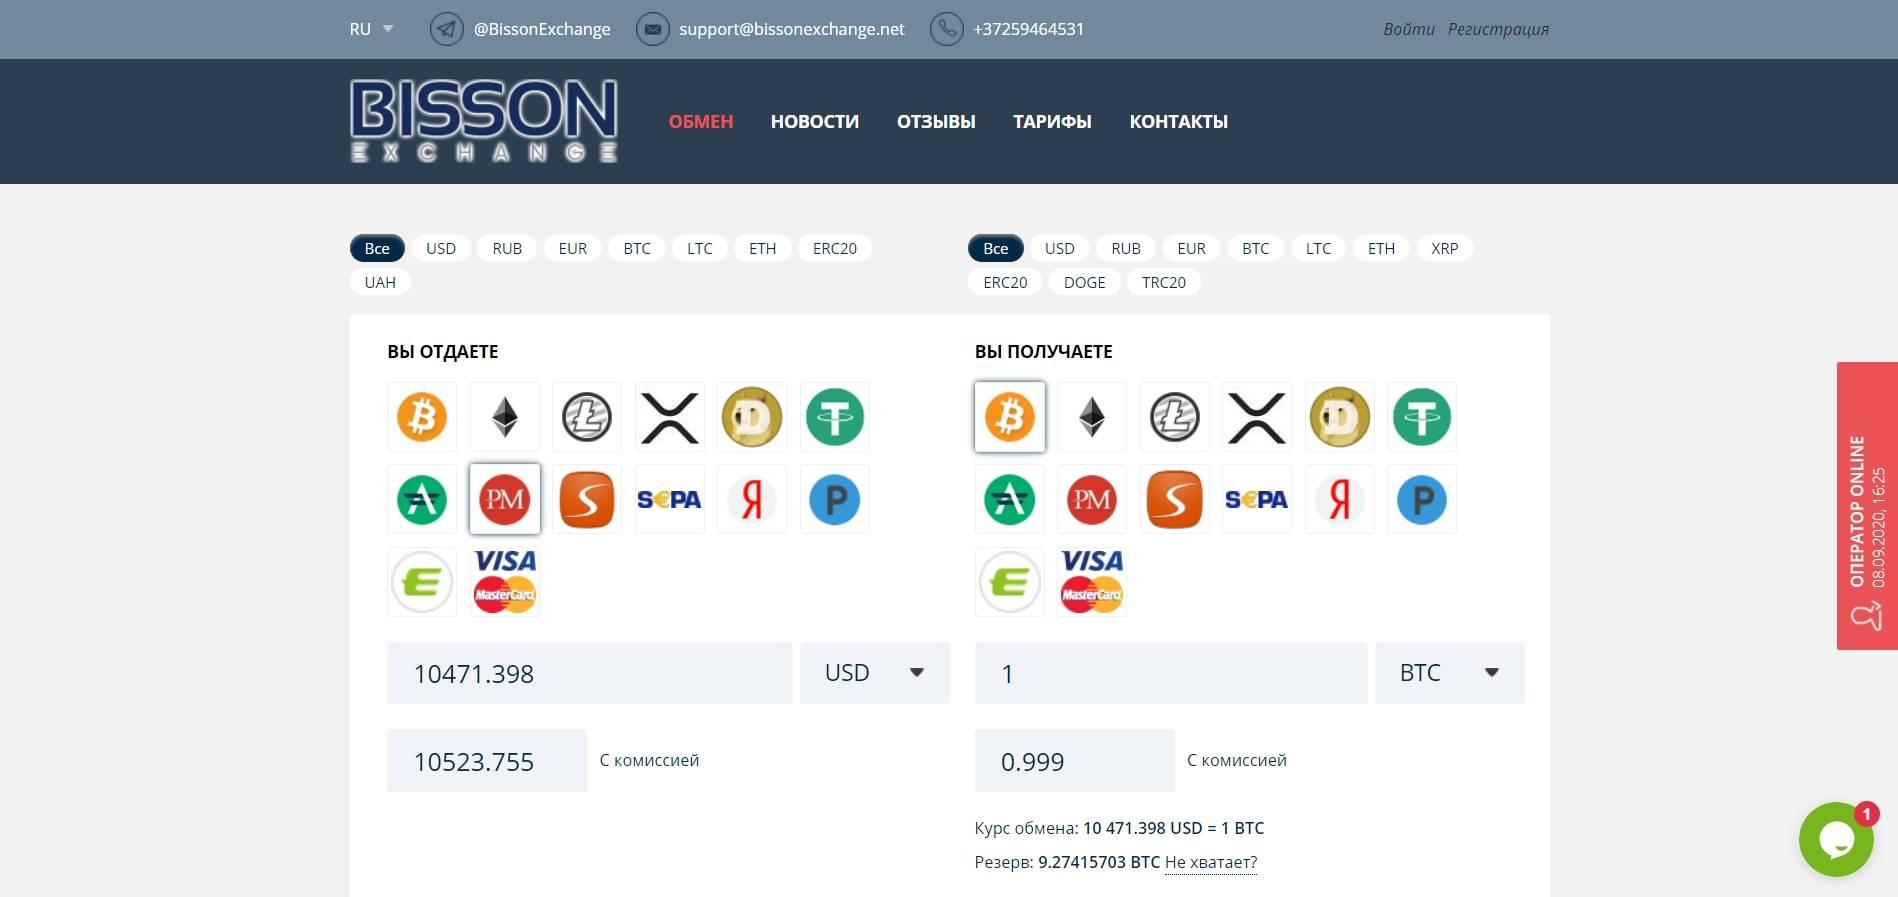 Bisson Exchange